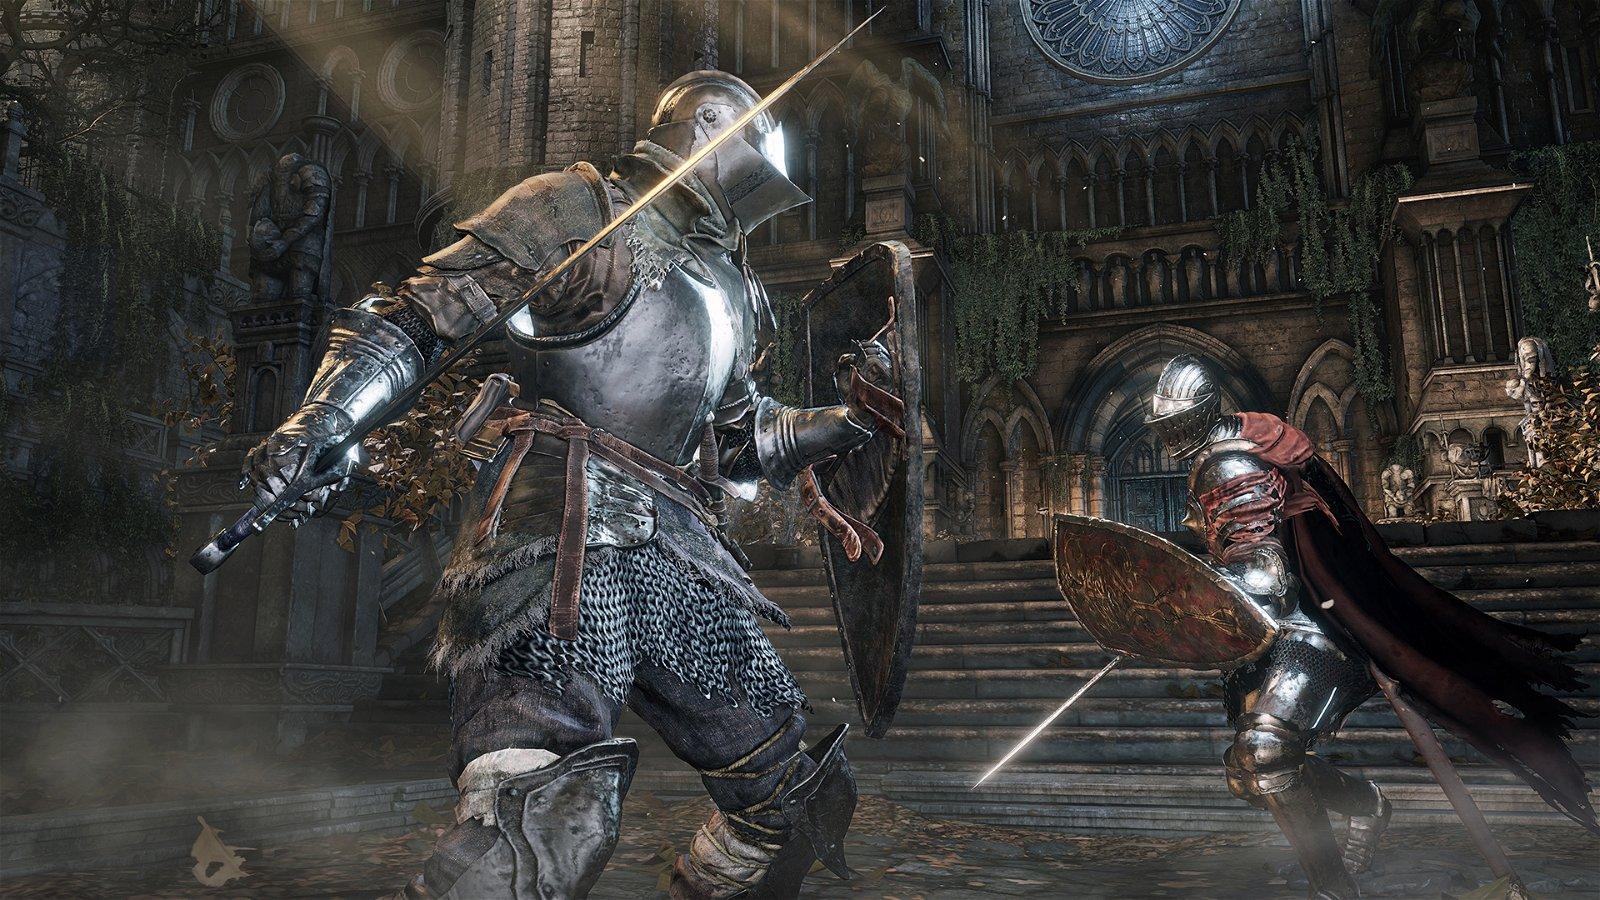 Dark Souls III DLC News Leaked Ahead Of Official Reveal